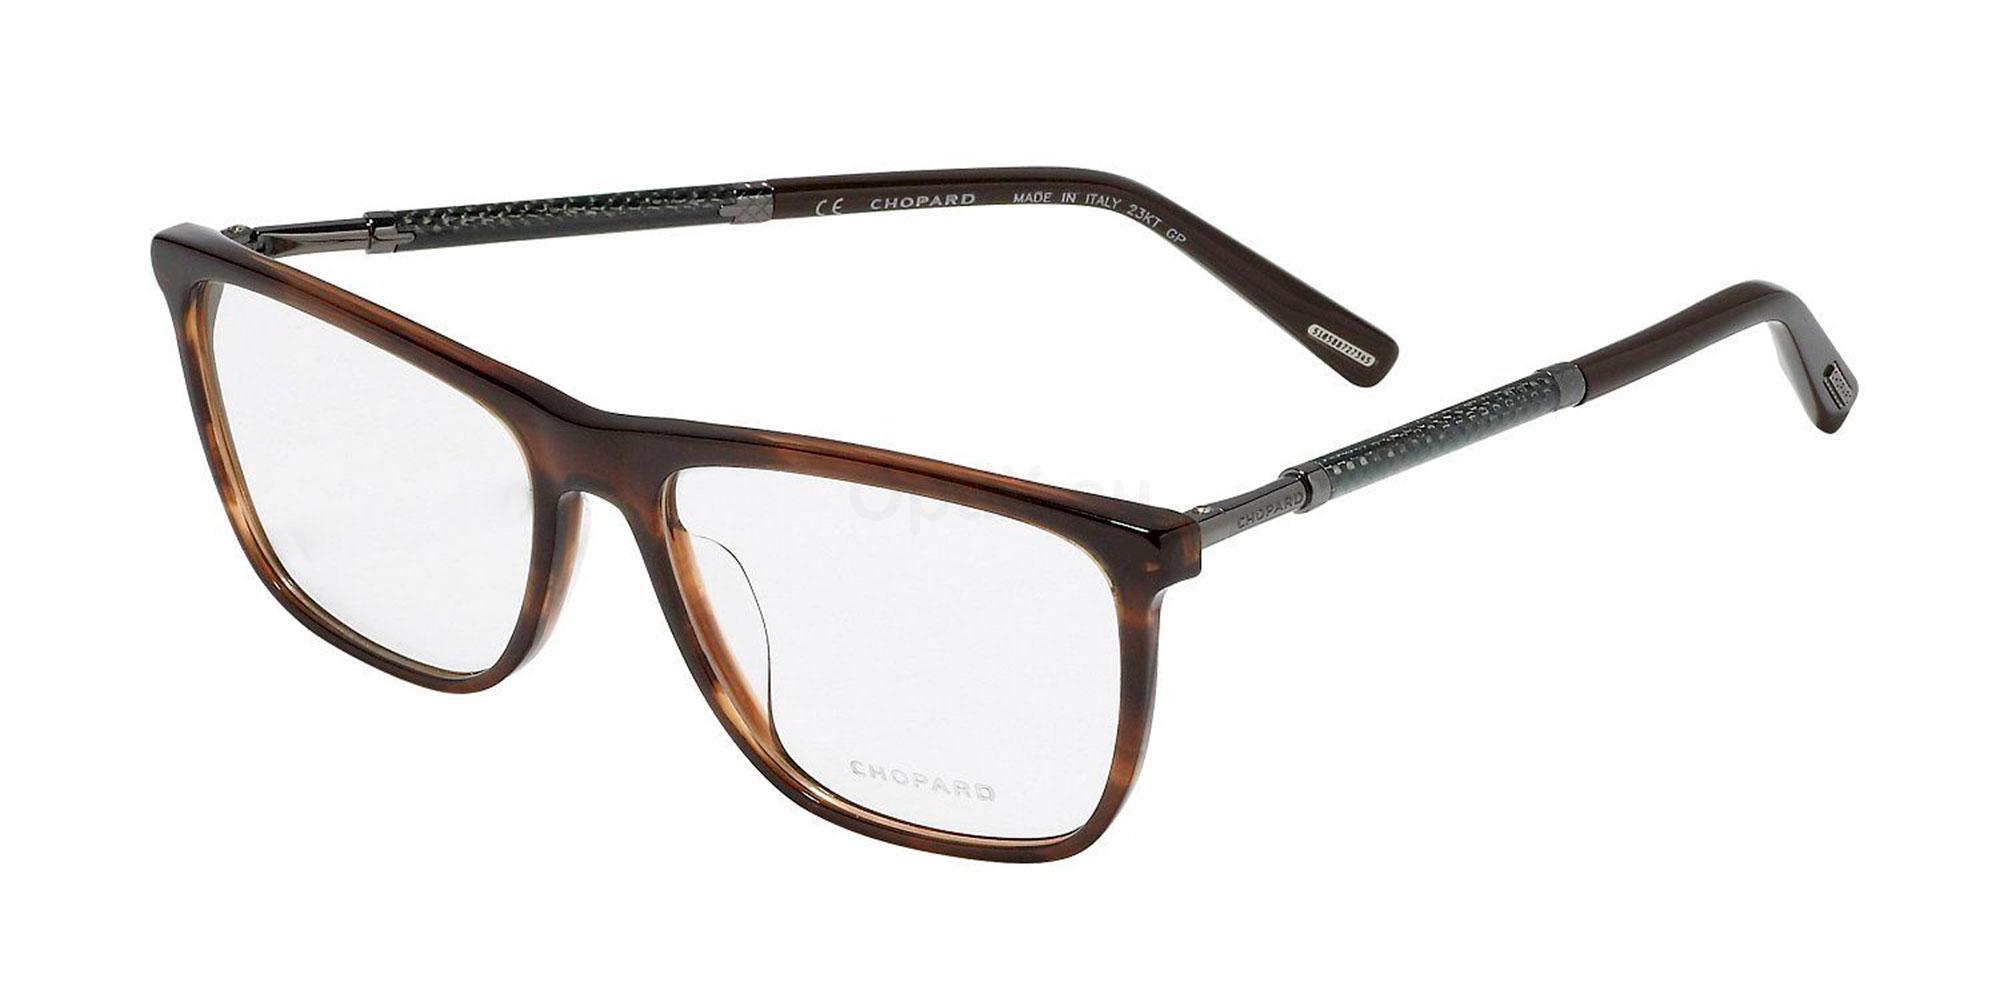 06YH VCH257 Glasses, Chopard